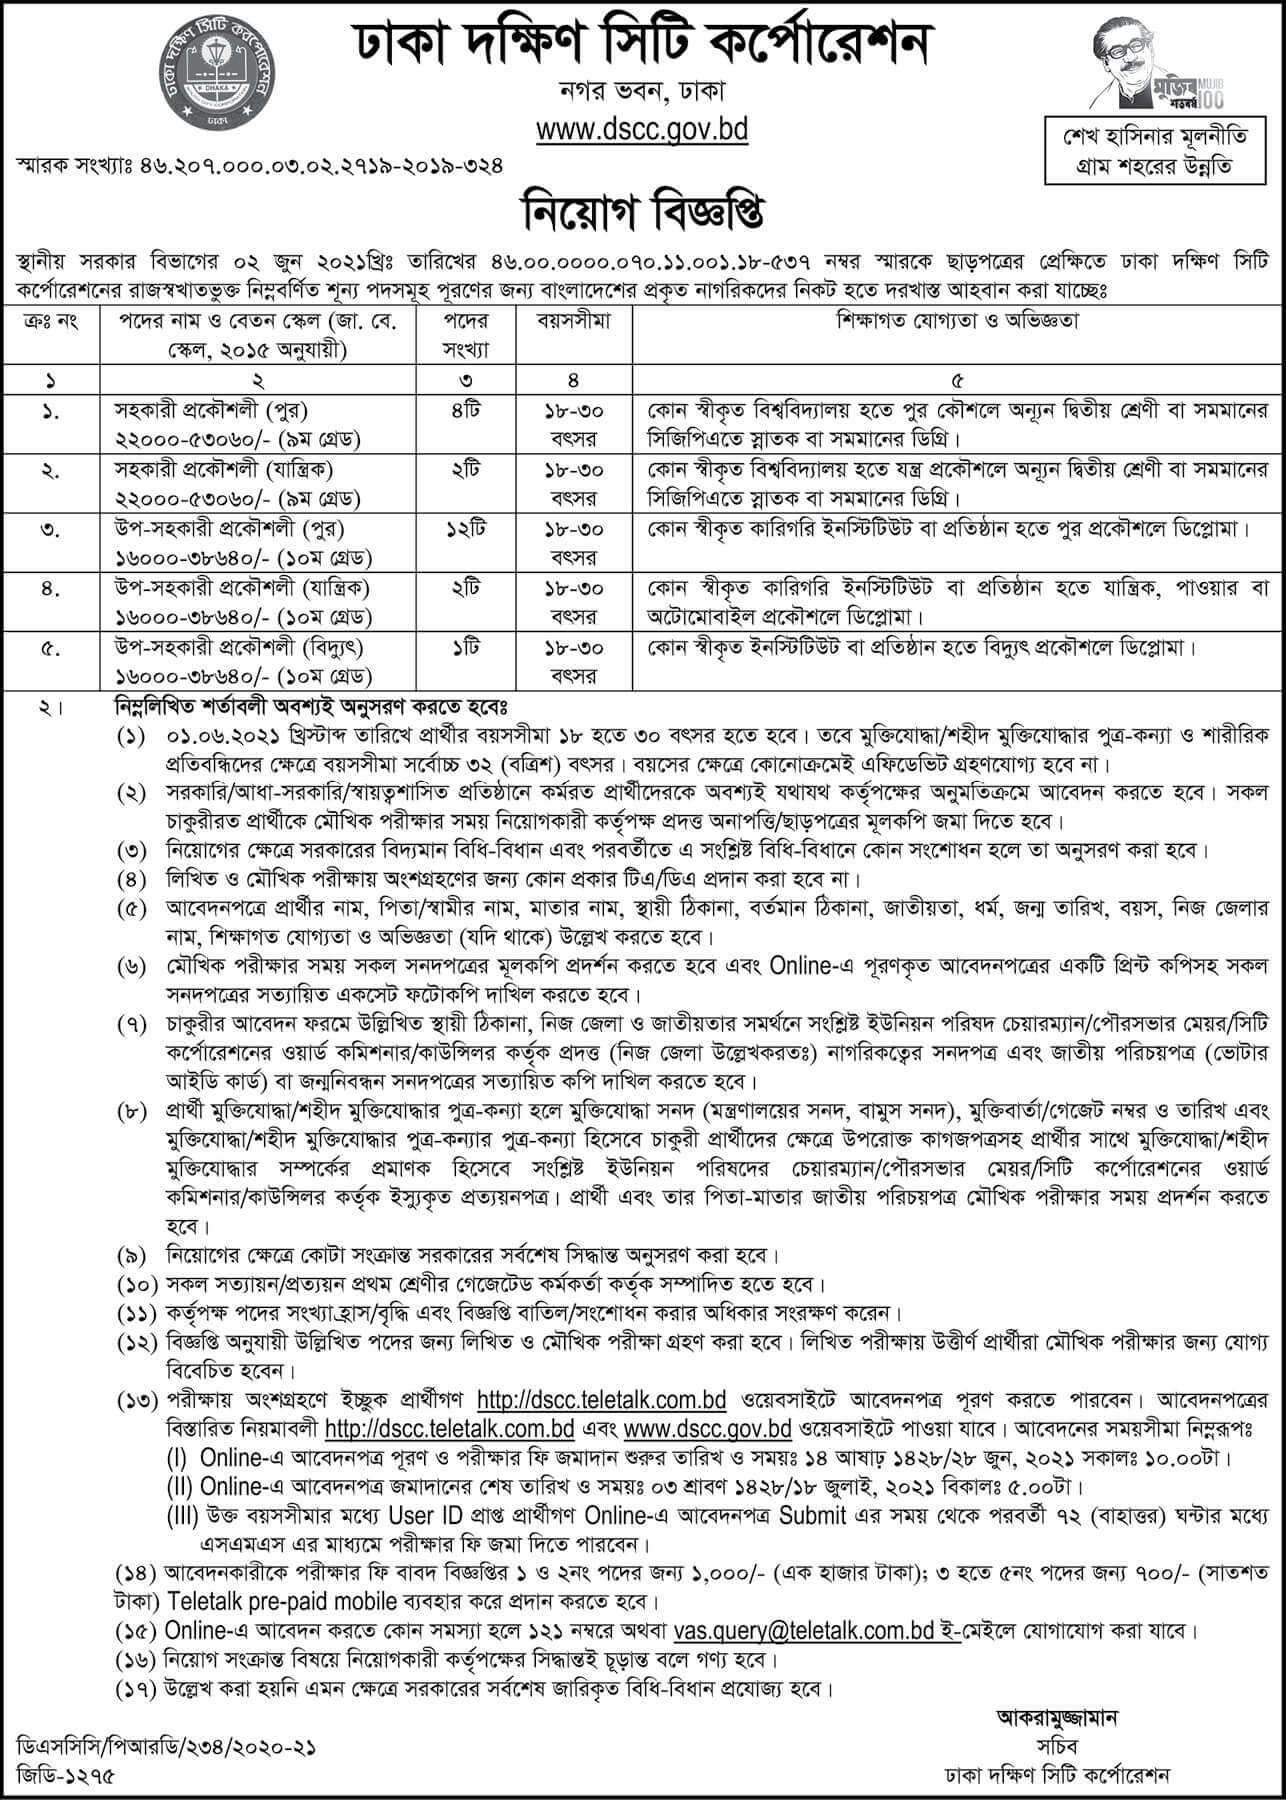 DSCC Job Circular 2021